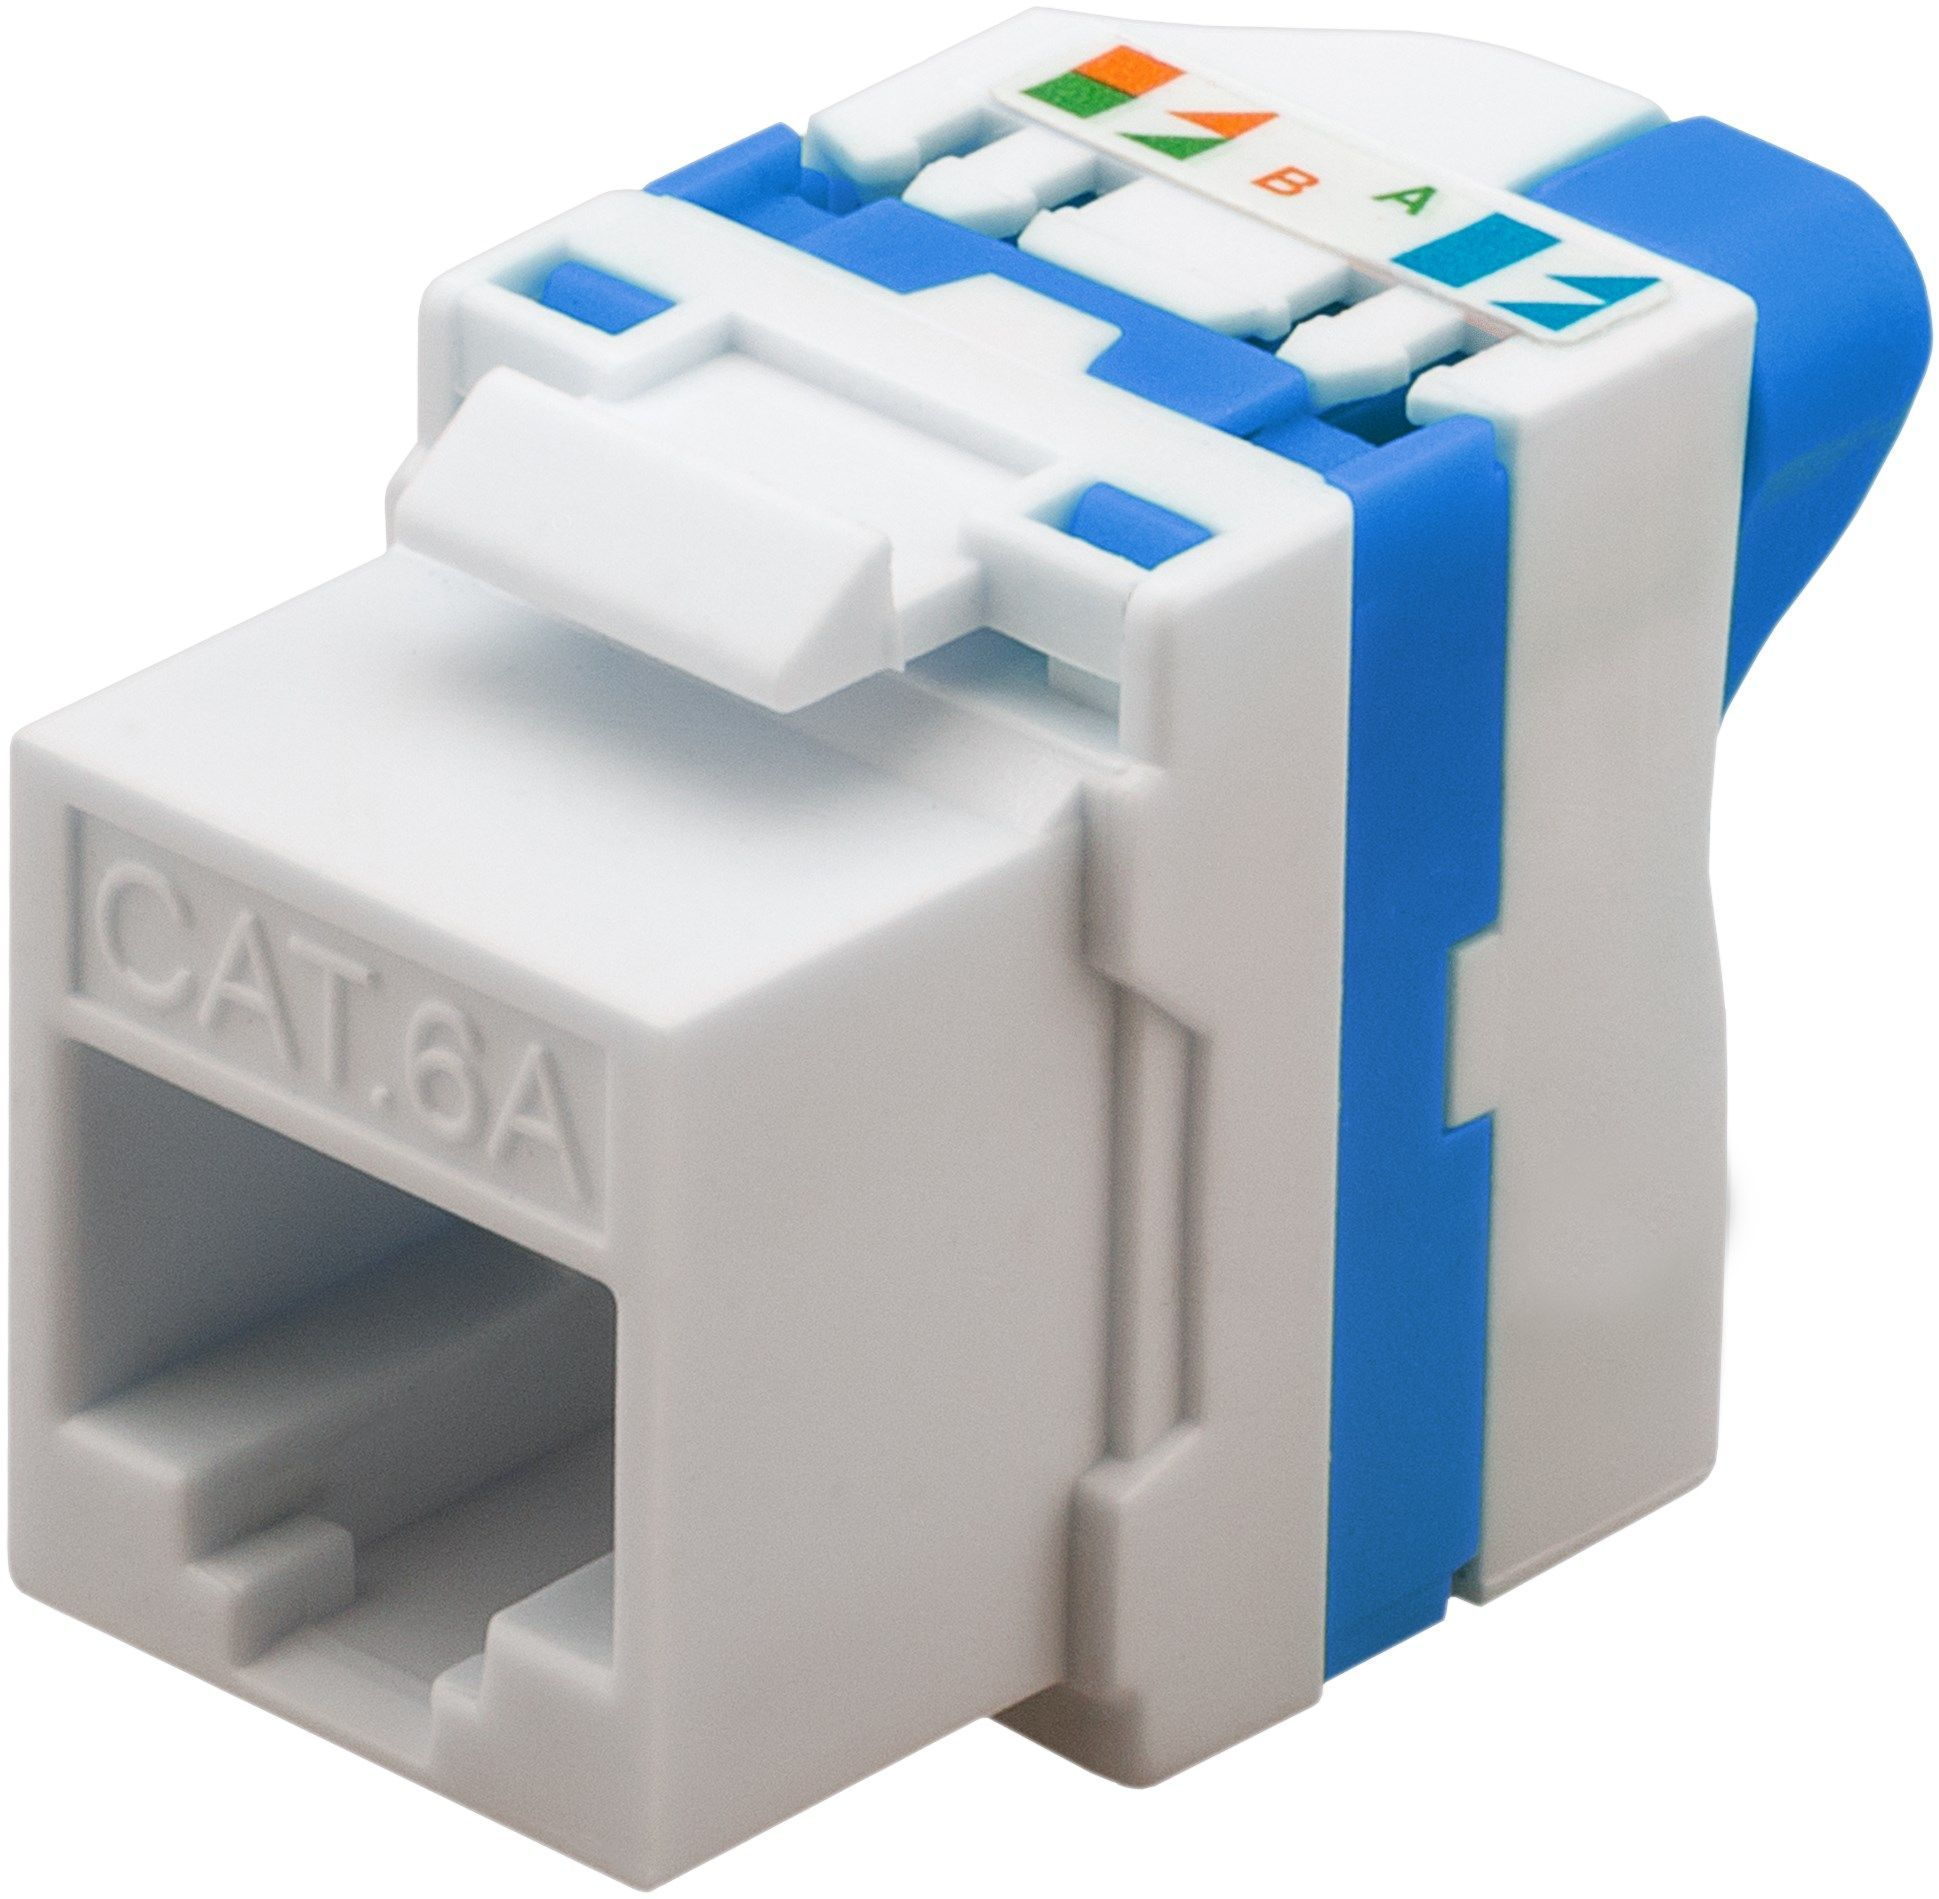 Jack CAT 6 White Modular Keystone C6 keystone Jack